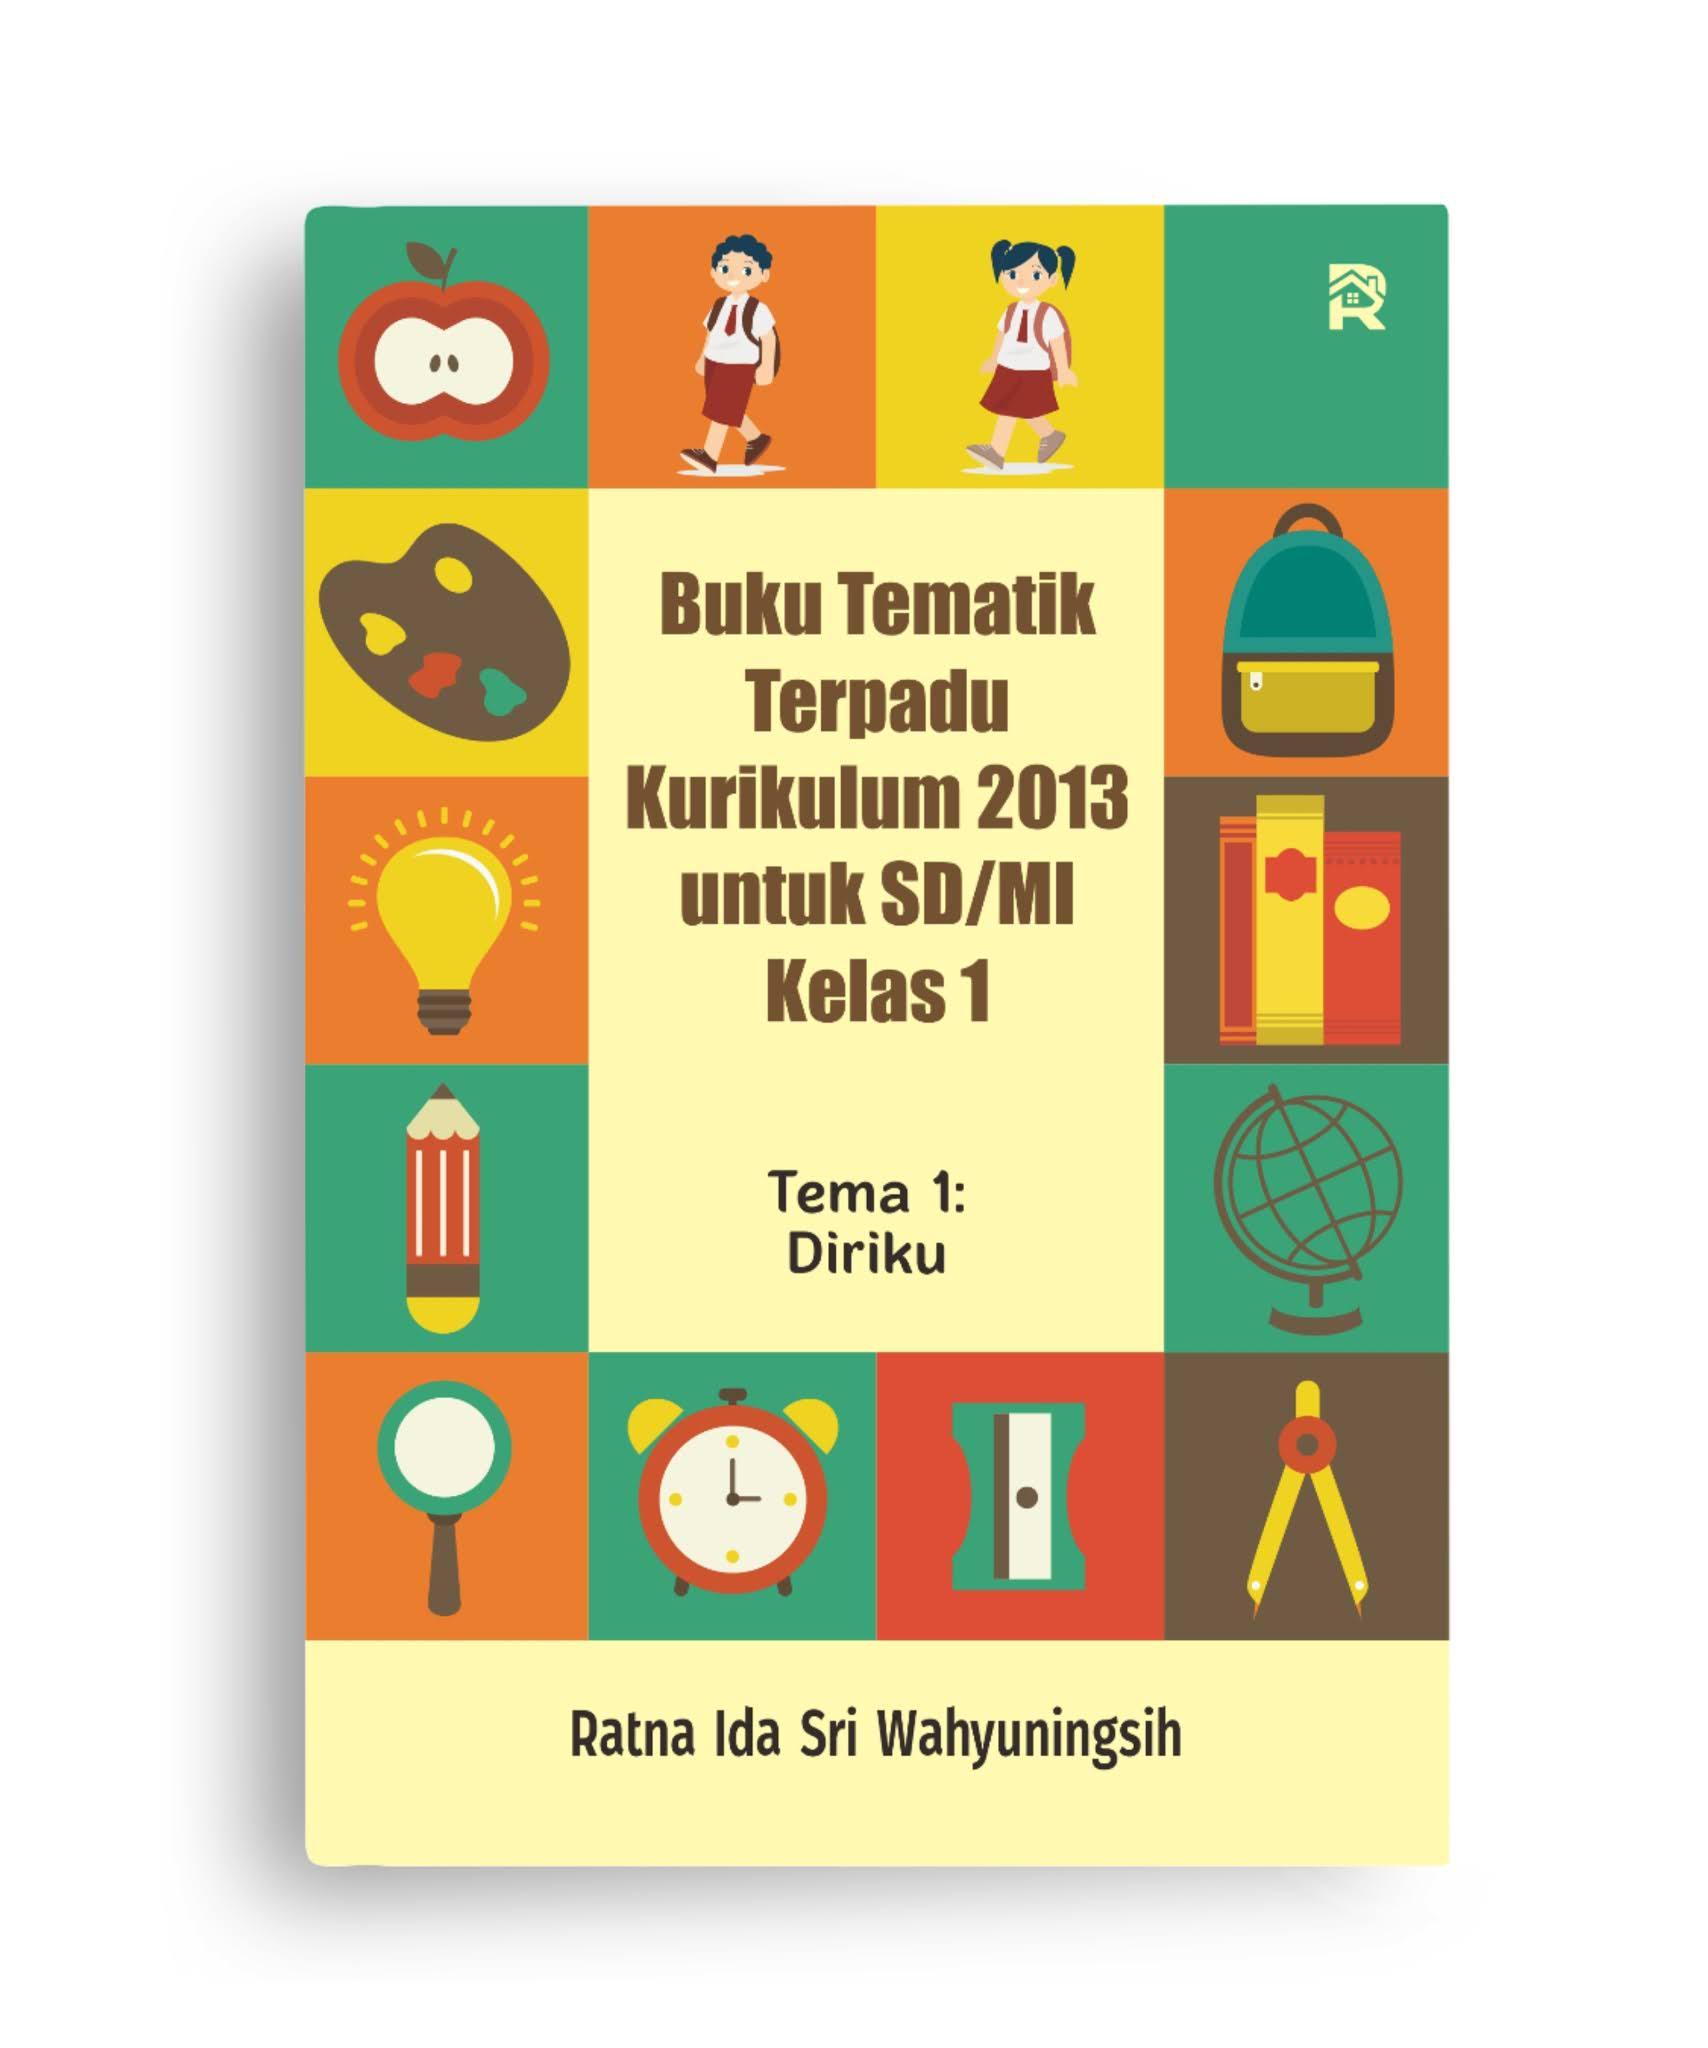 Buku Tematik Terpadu Kurikulum 2013 untuk SD/MI Kelas 1 (Tema 1: Diriku)